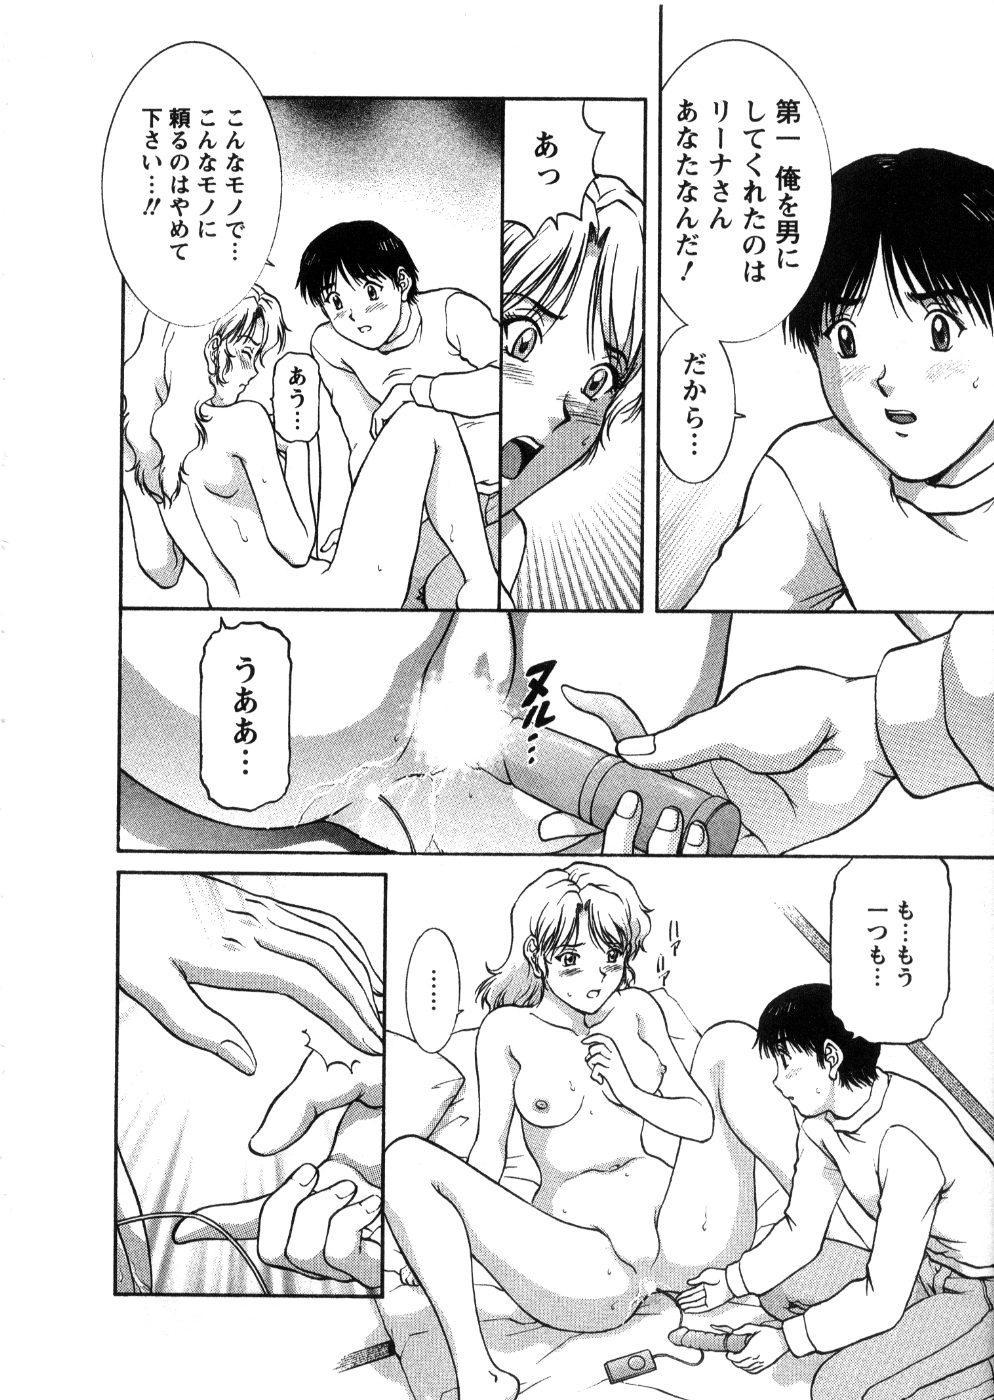 Oneechan-tachi ga Yatte Kuru 03 103